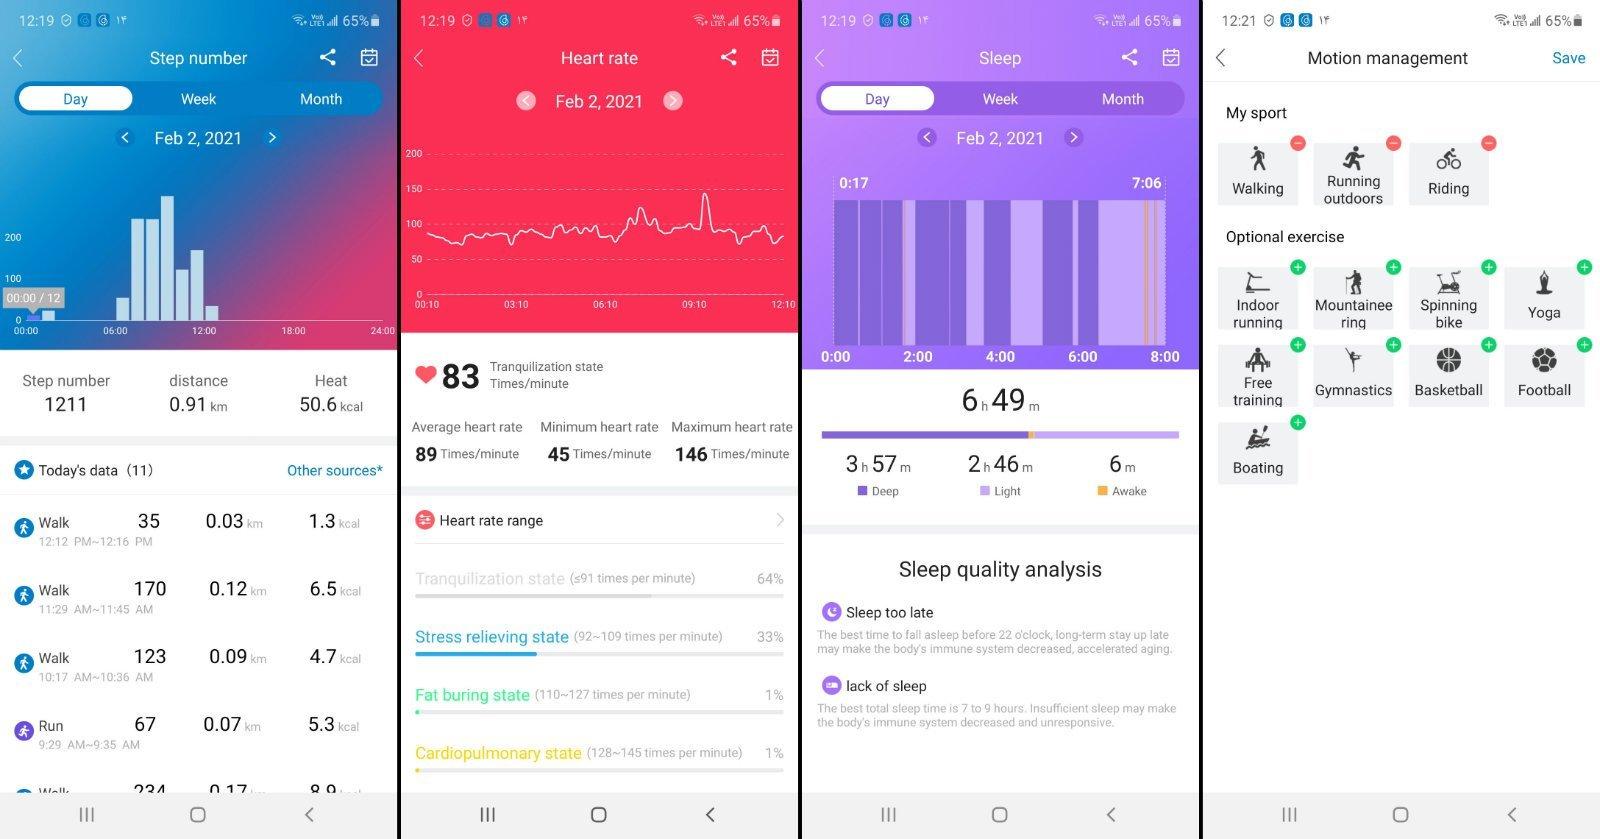 HaylouFit UI 2 w1600 بررسی ساعت هوشمند هایلو سولار؛ پر فروش و پر دردسر [تماشا کنید] اخبار IT